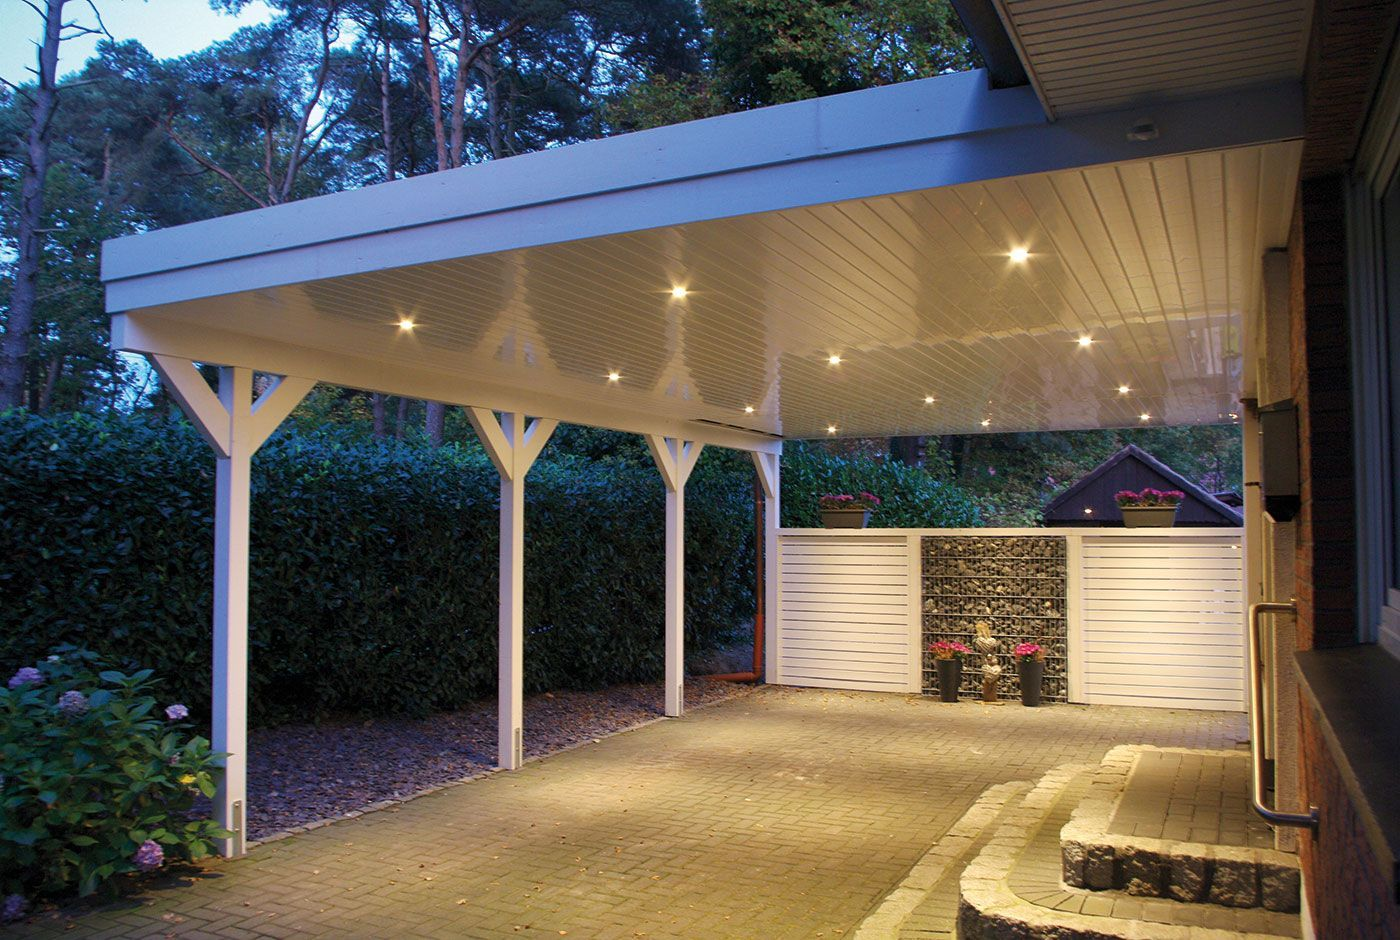 Online Shop Steda Glas & Gartendesign Carport patio